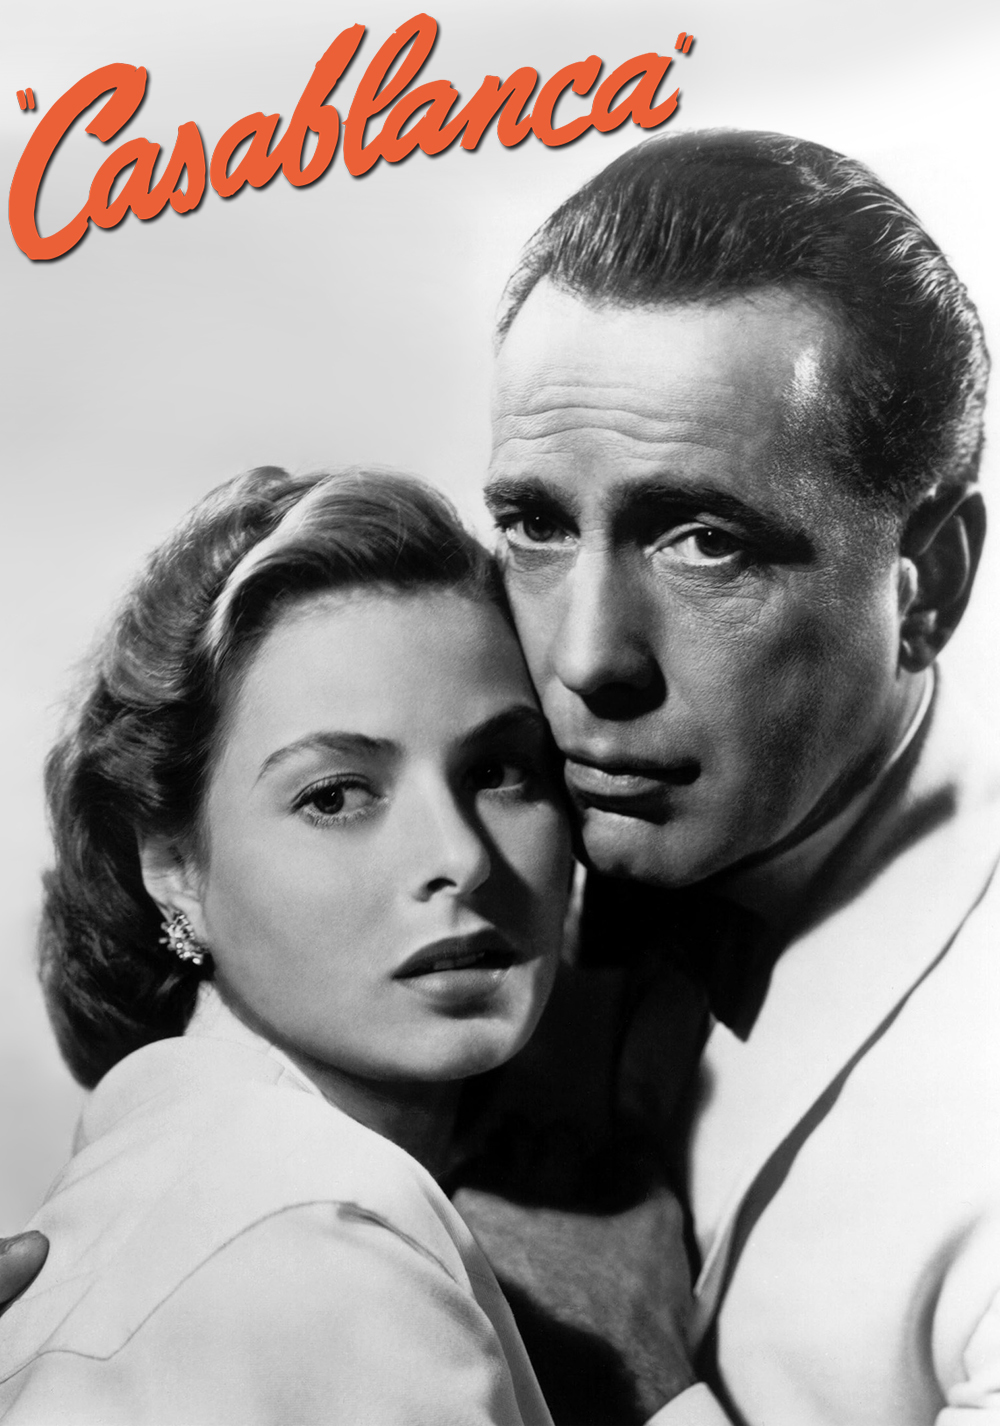 Casablanca  Movie fanart  fanart